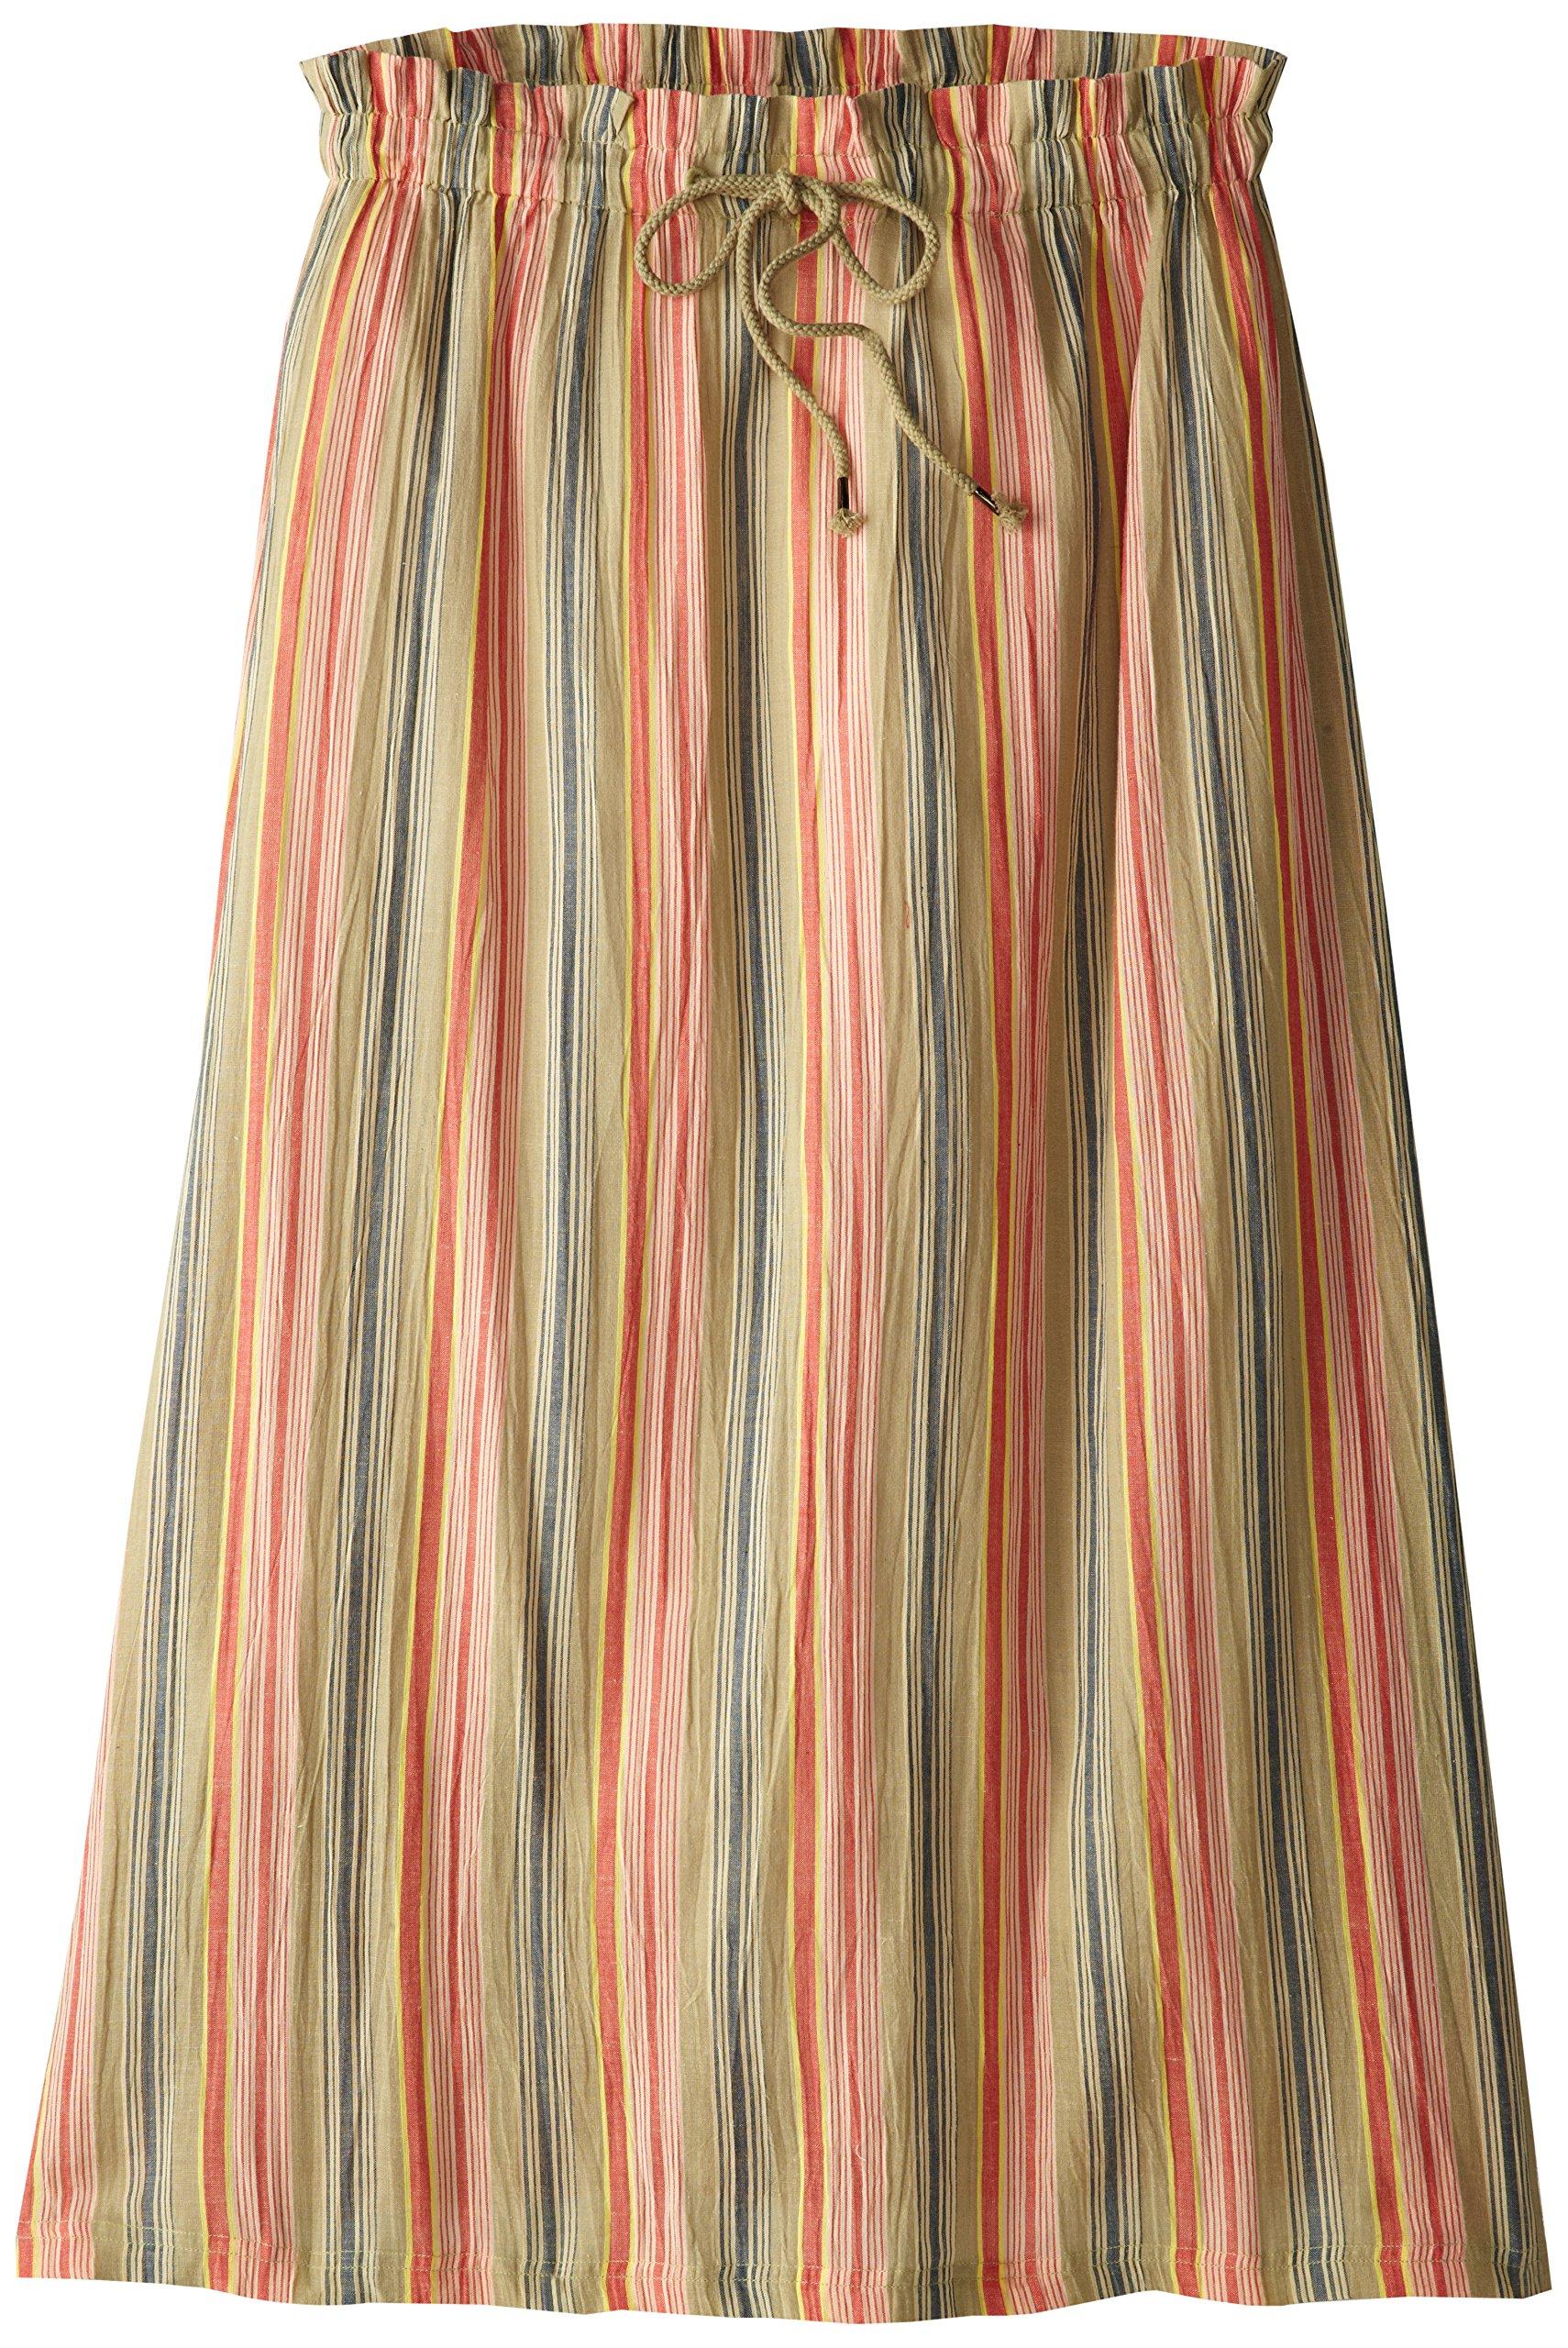 Gramicci Women's Naveen Kaftan Maxi Skirt, Rainbow, Small